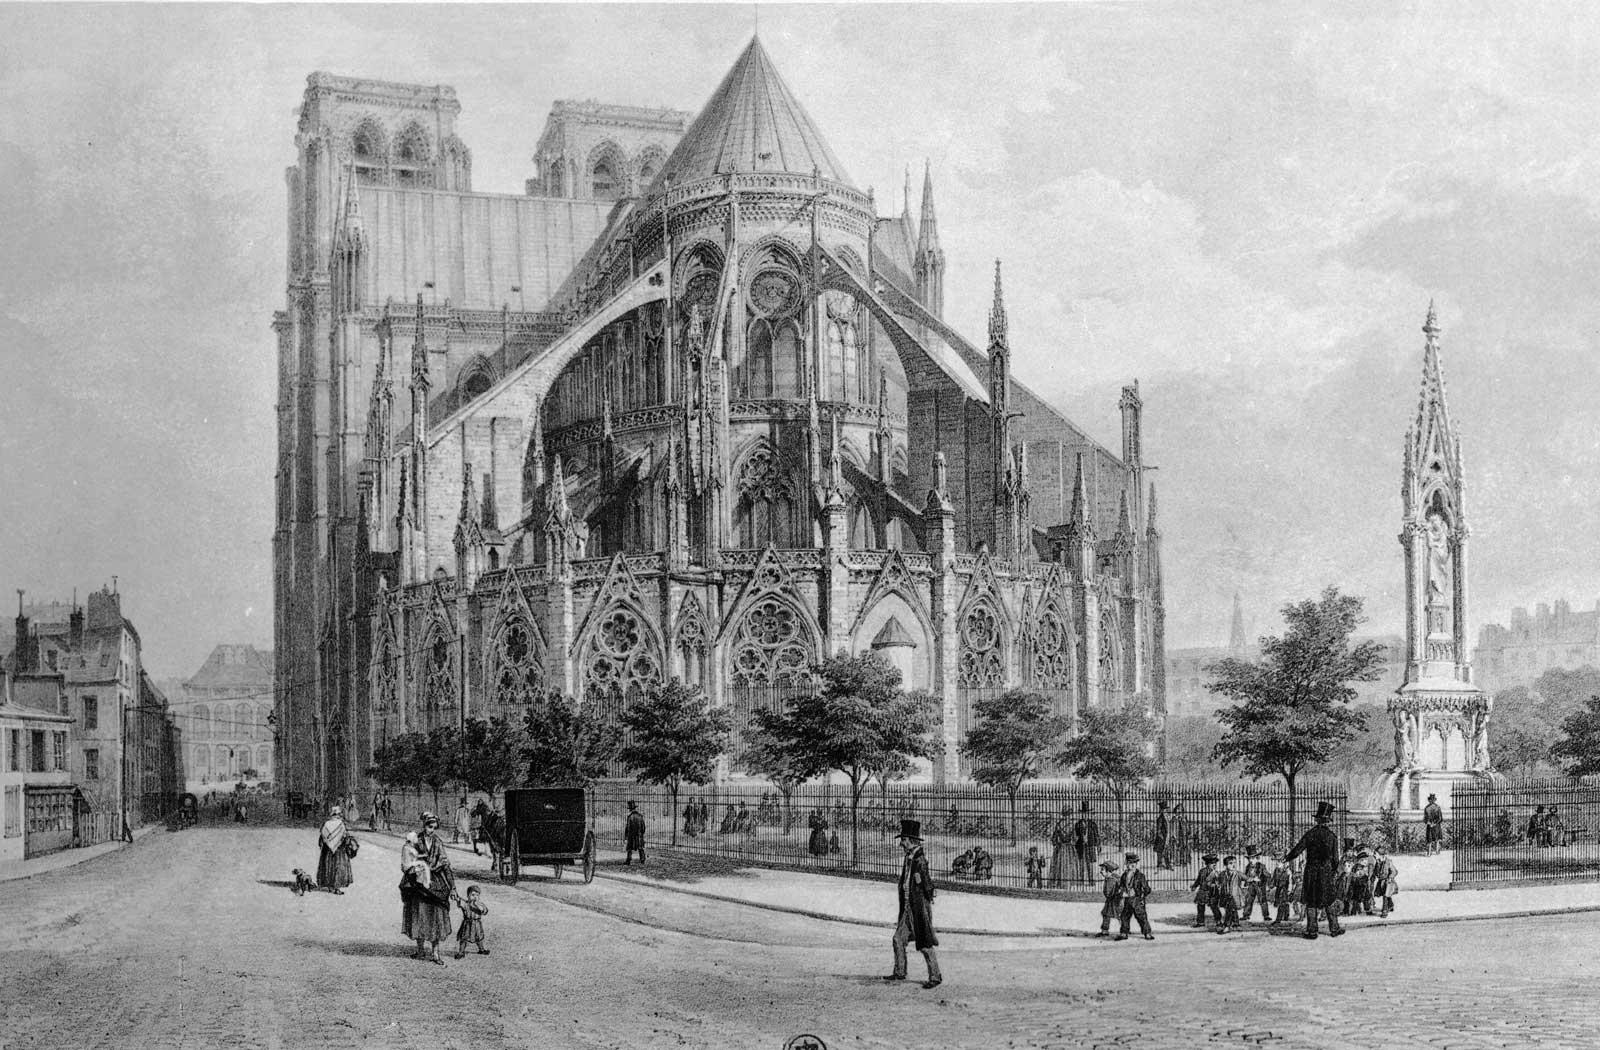 catedrala de notre dame paris inainte